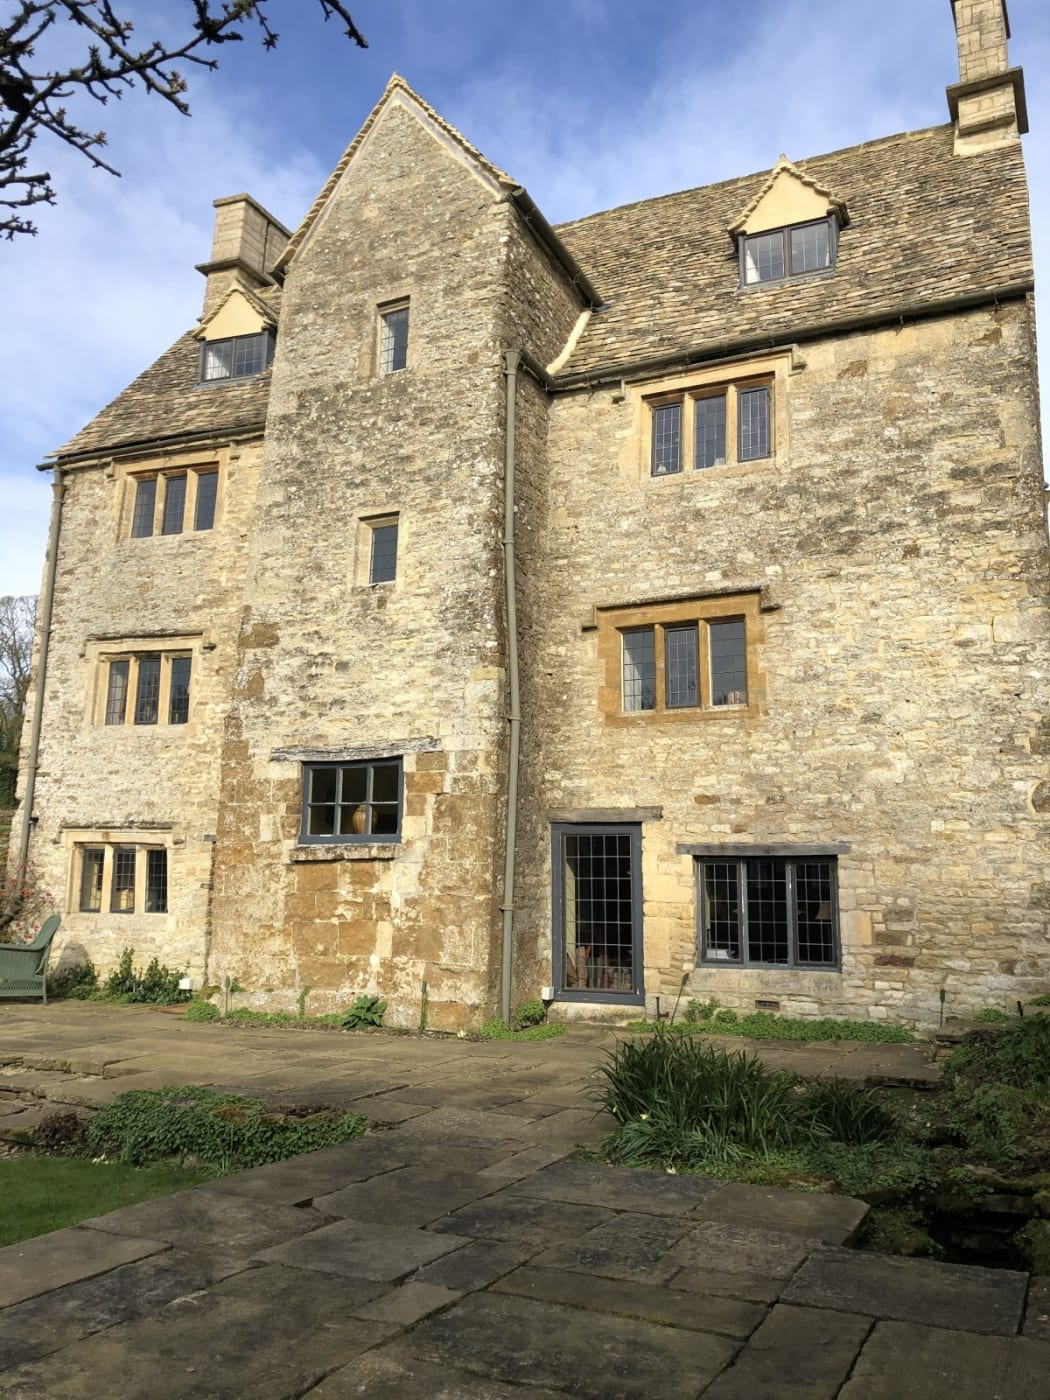 Philip Mould's House